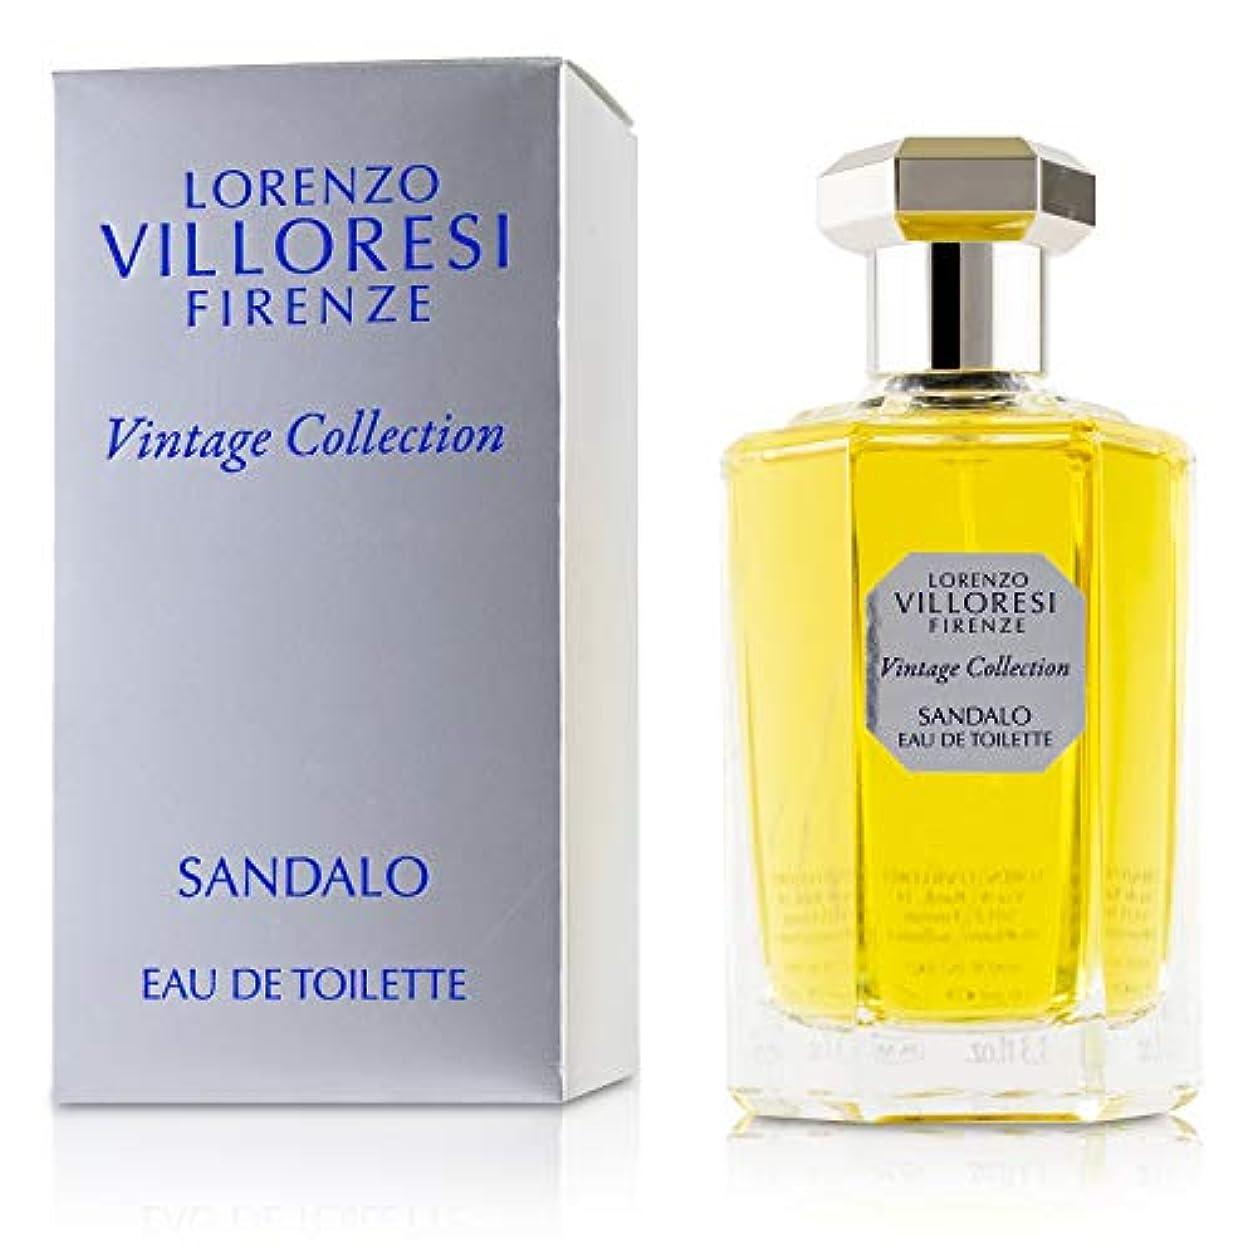 保守的壊れた意図的Lorenzo Villoresi Firenze Sandalo by Lorenzo Villoresi Eau De Toilette Spray (Unisex) 3.3 oz / 100 ml (Women)